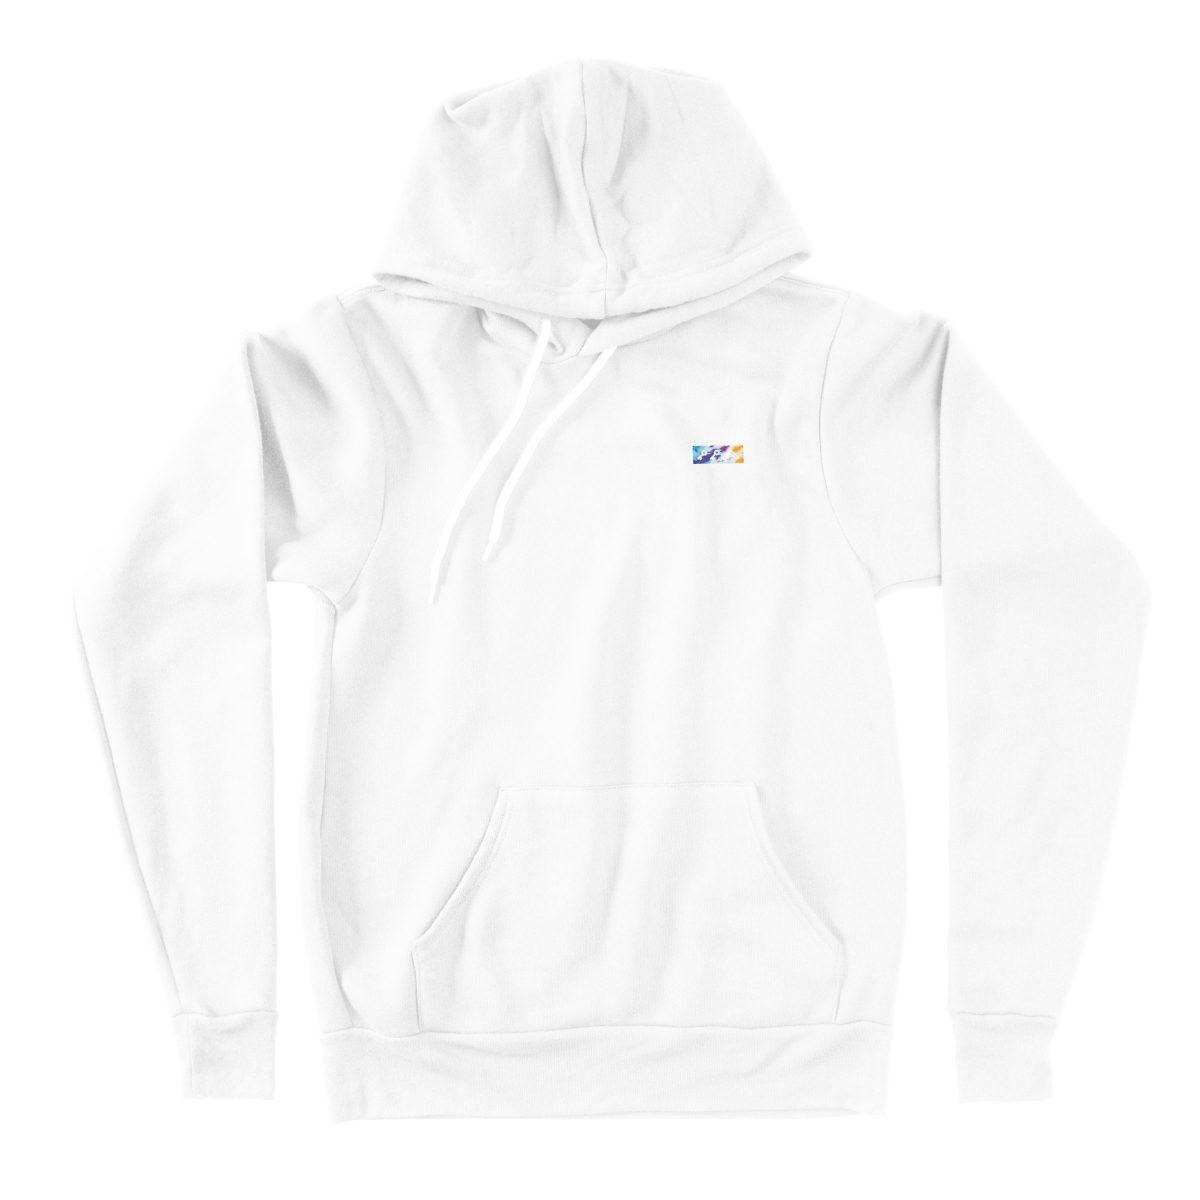 TIE DYE KIKICUTT hoodies by kikicutt sweatshirt store